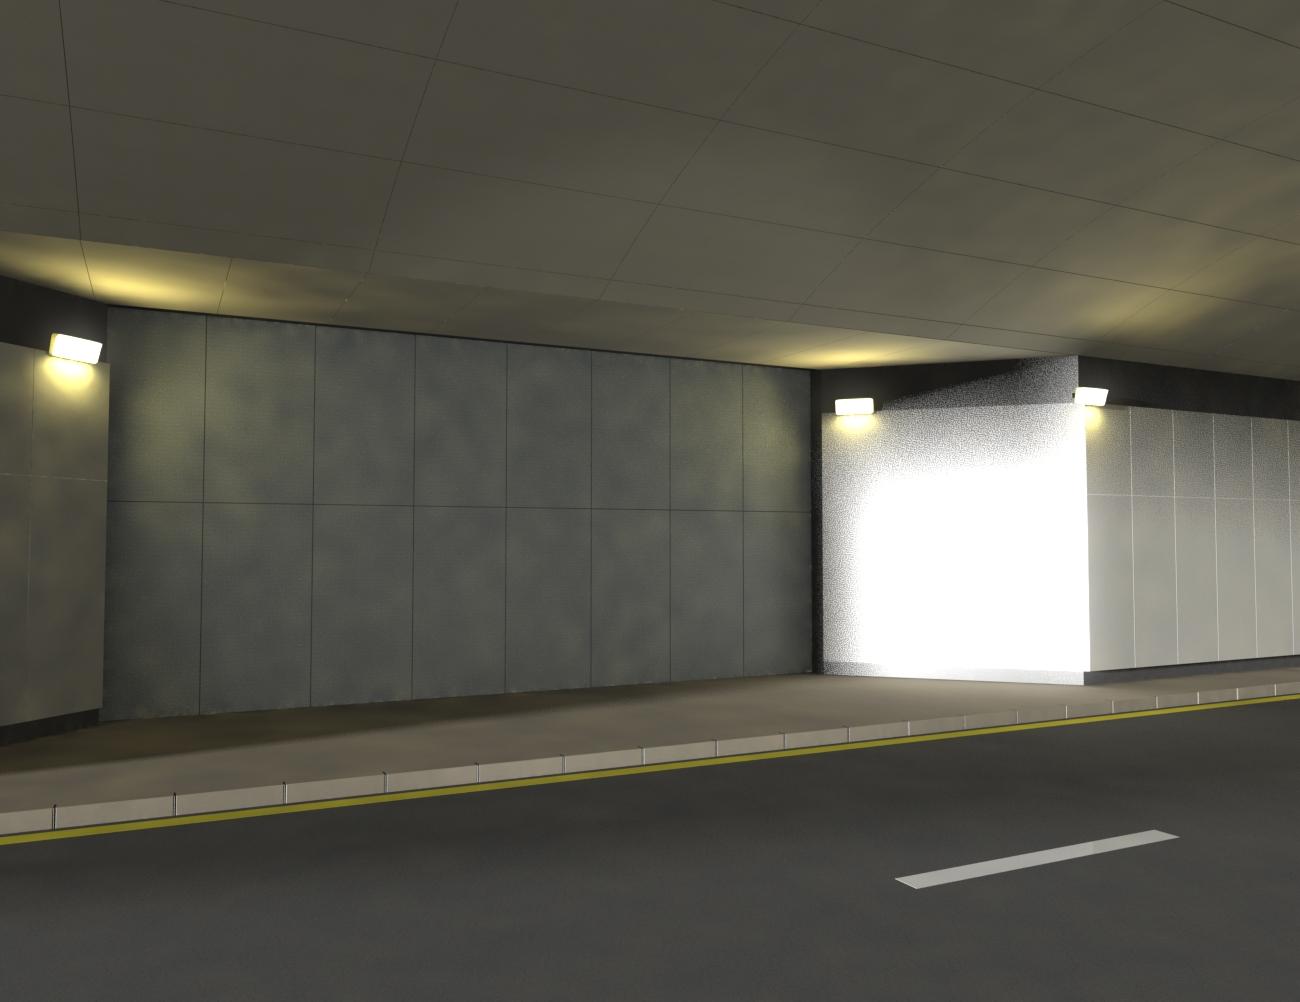 Asse Tunnel 2 camera 6 Bright 075.JPG